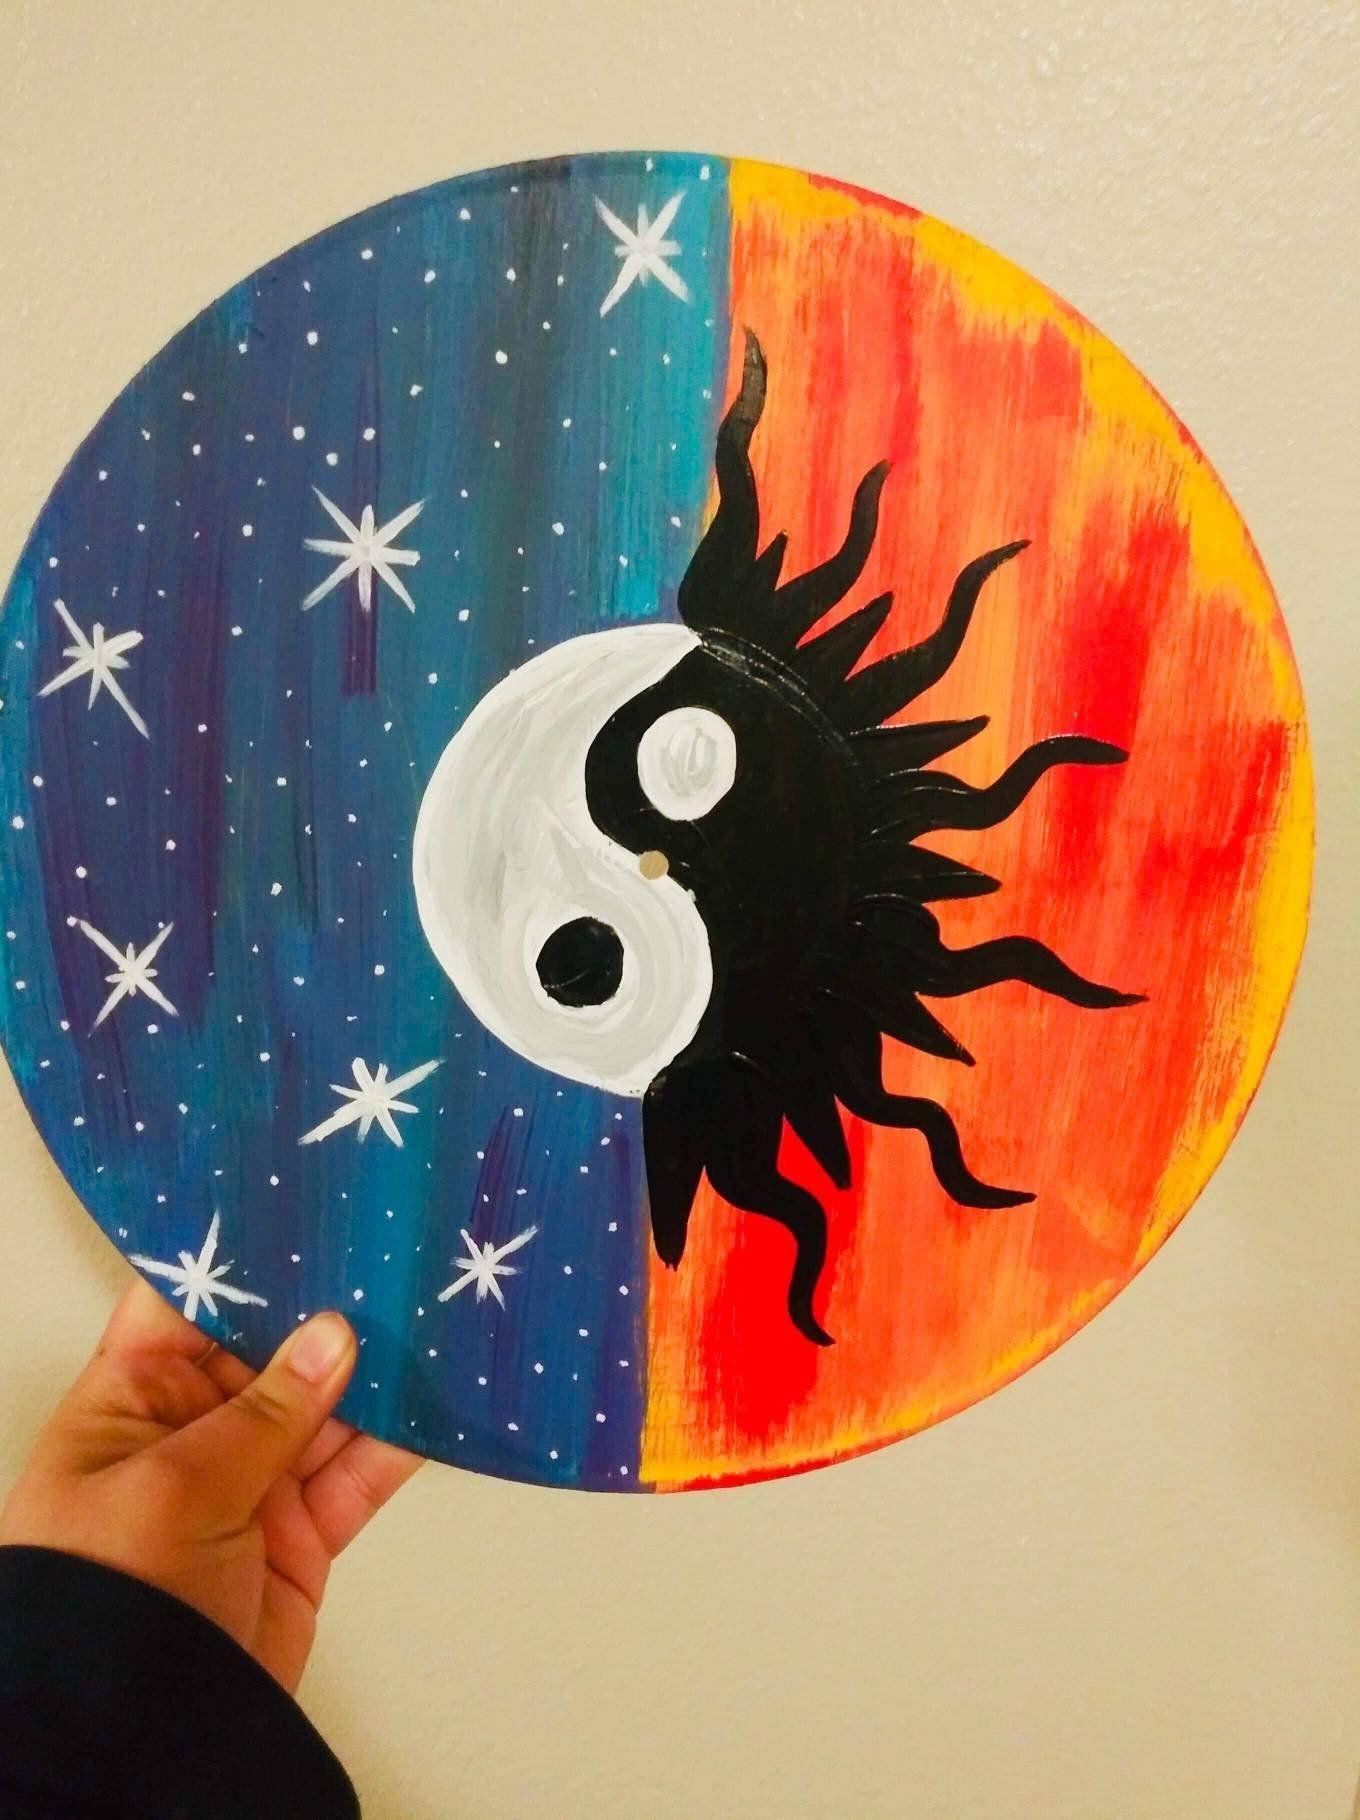 Artideas Vinyl Record Art Hippie Painting Buy Art Artworks